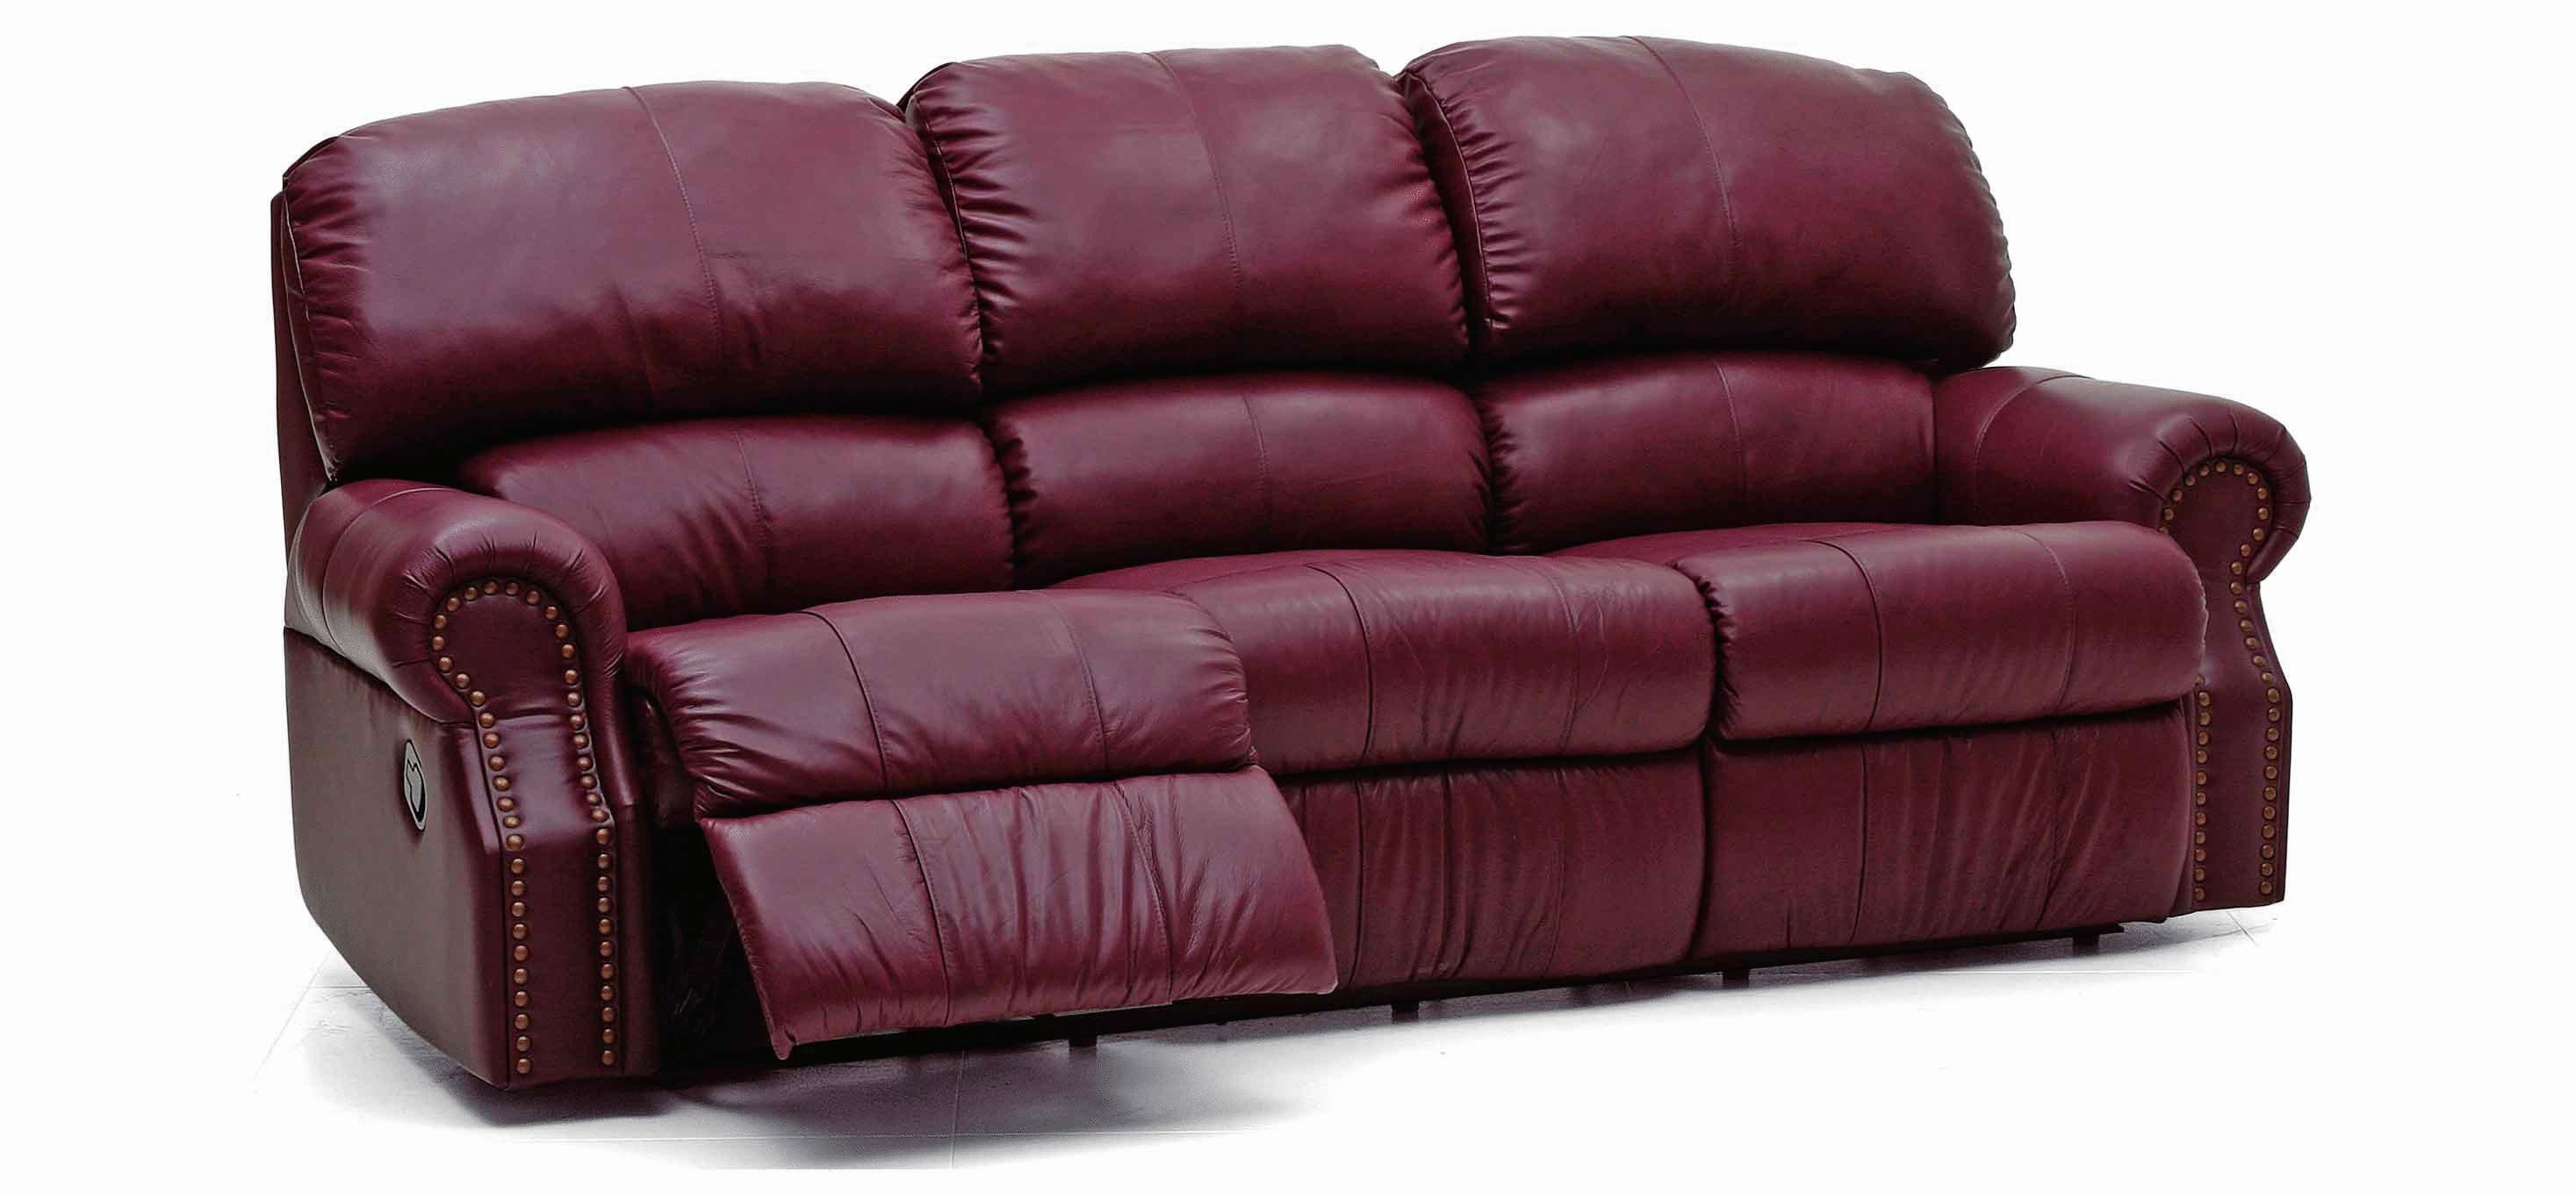 Sofas Center : Diy Slipcover For Reclininga Best Decoration Covers Regarding Slipcover For Recliner Sofas (Image 17 of 20)